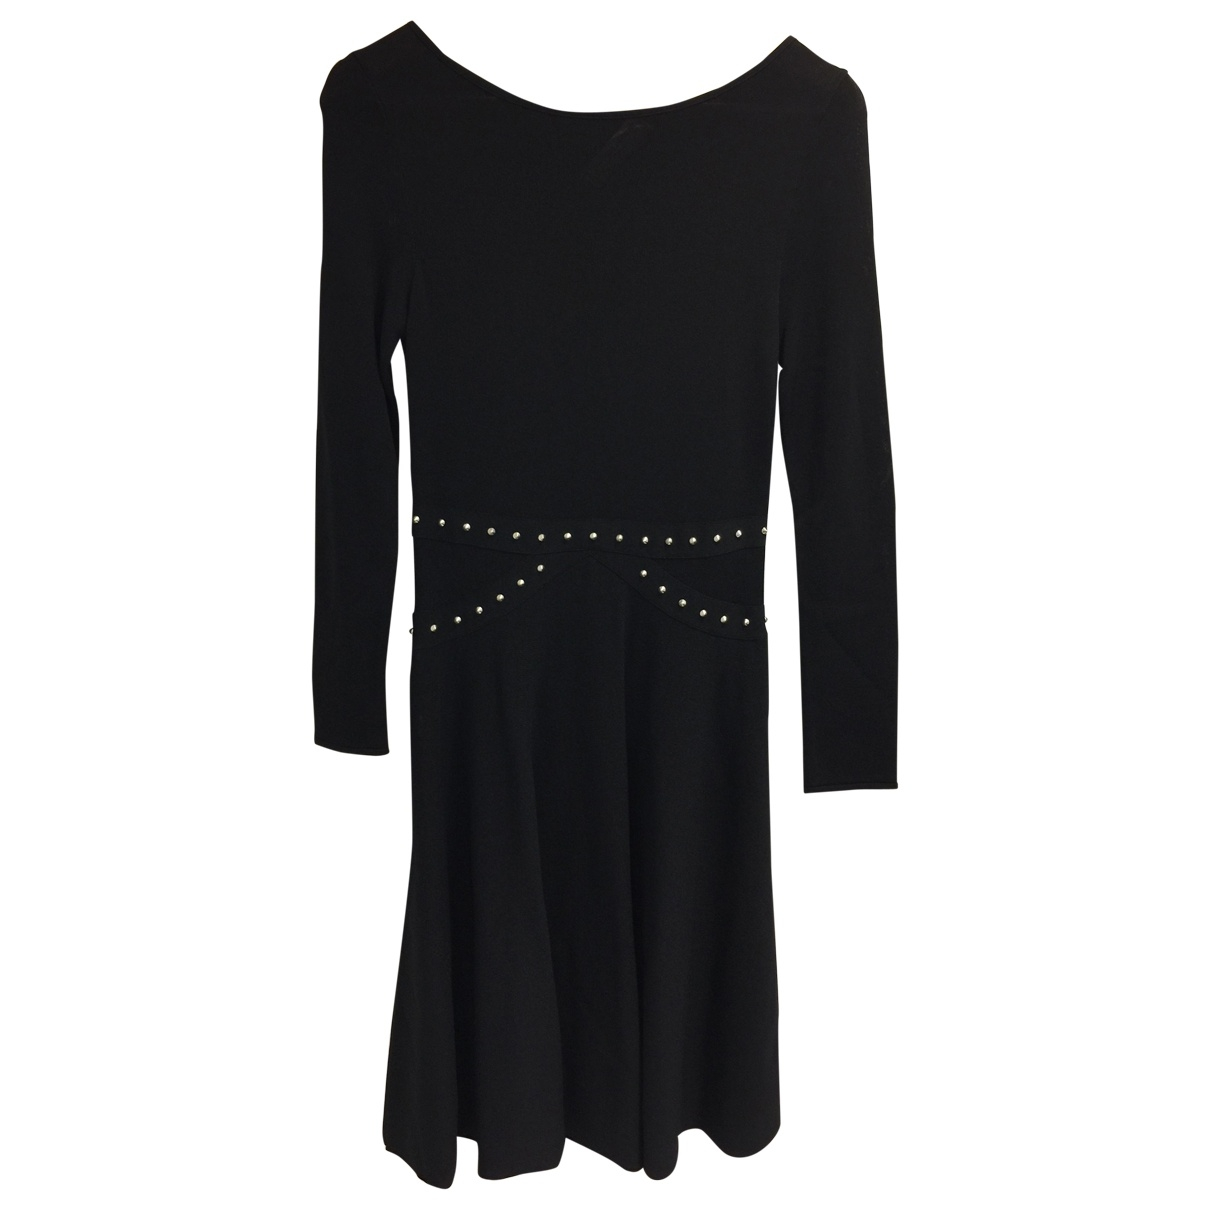 Saint Laurent \N Kleid in  Schwarz Baumwolle